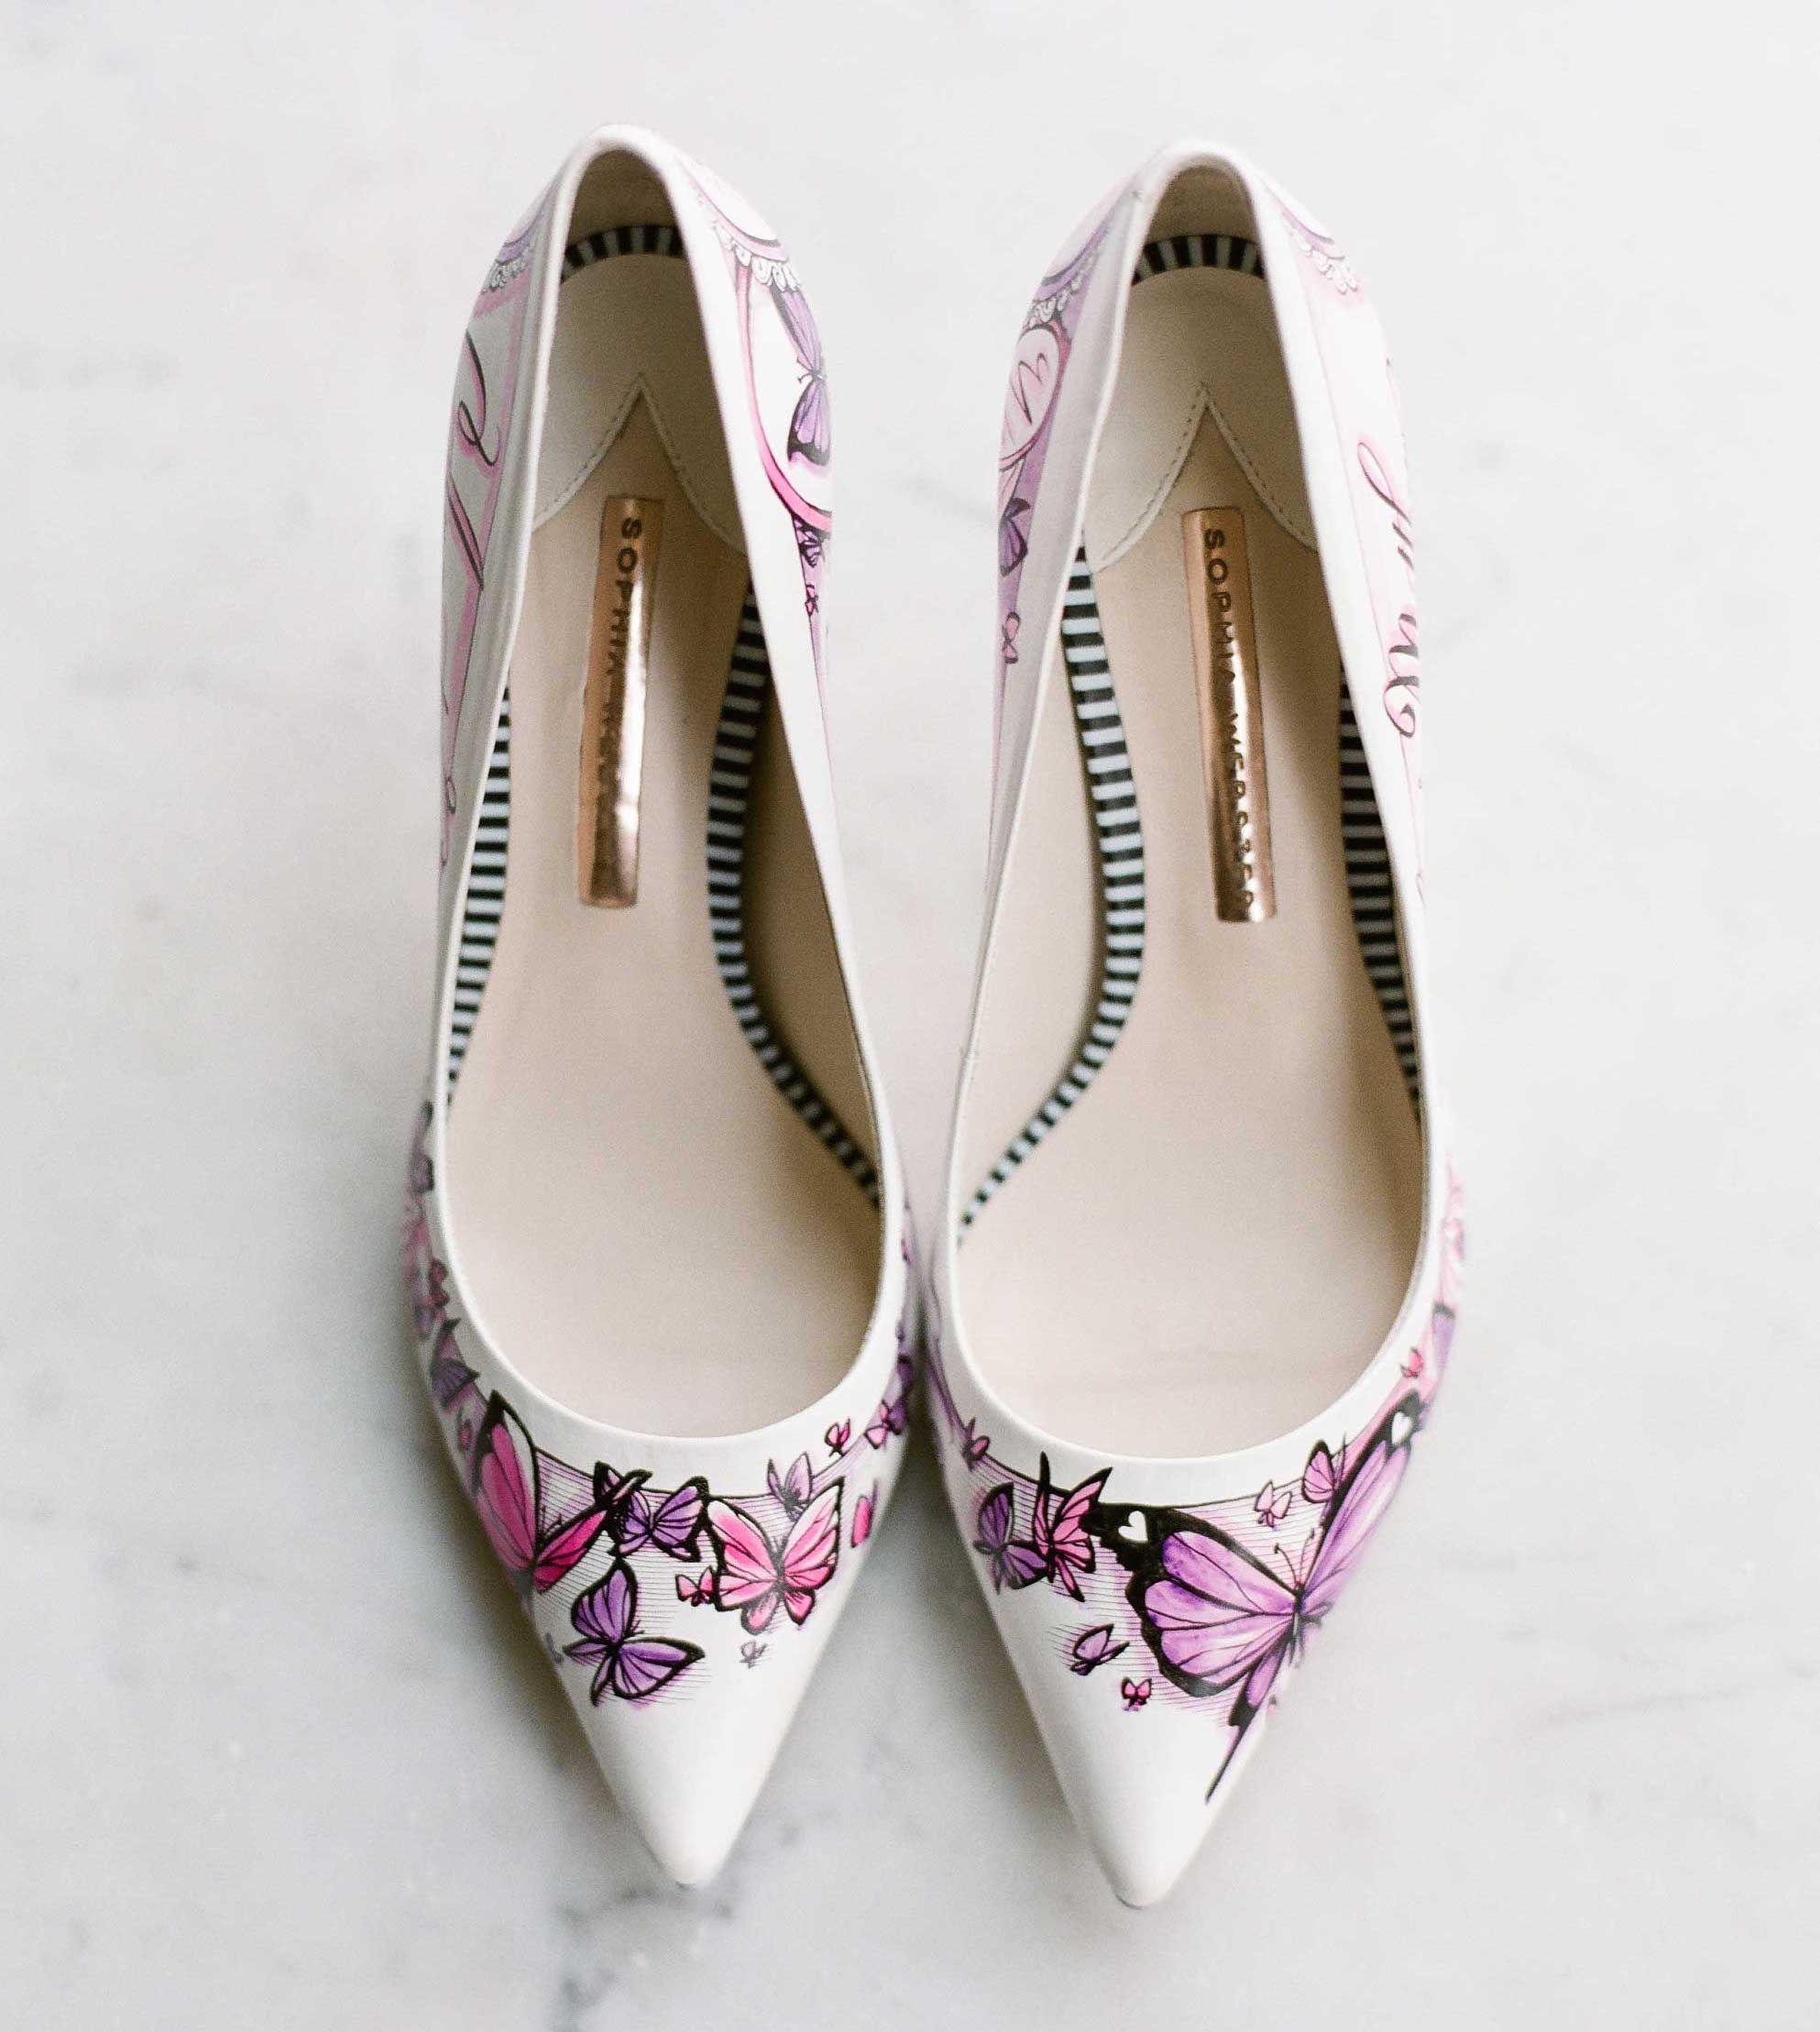 Hand Drawn Pink Erfly Design On White Wedding Shoe Pumps